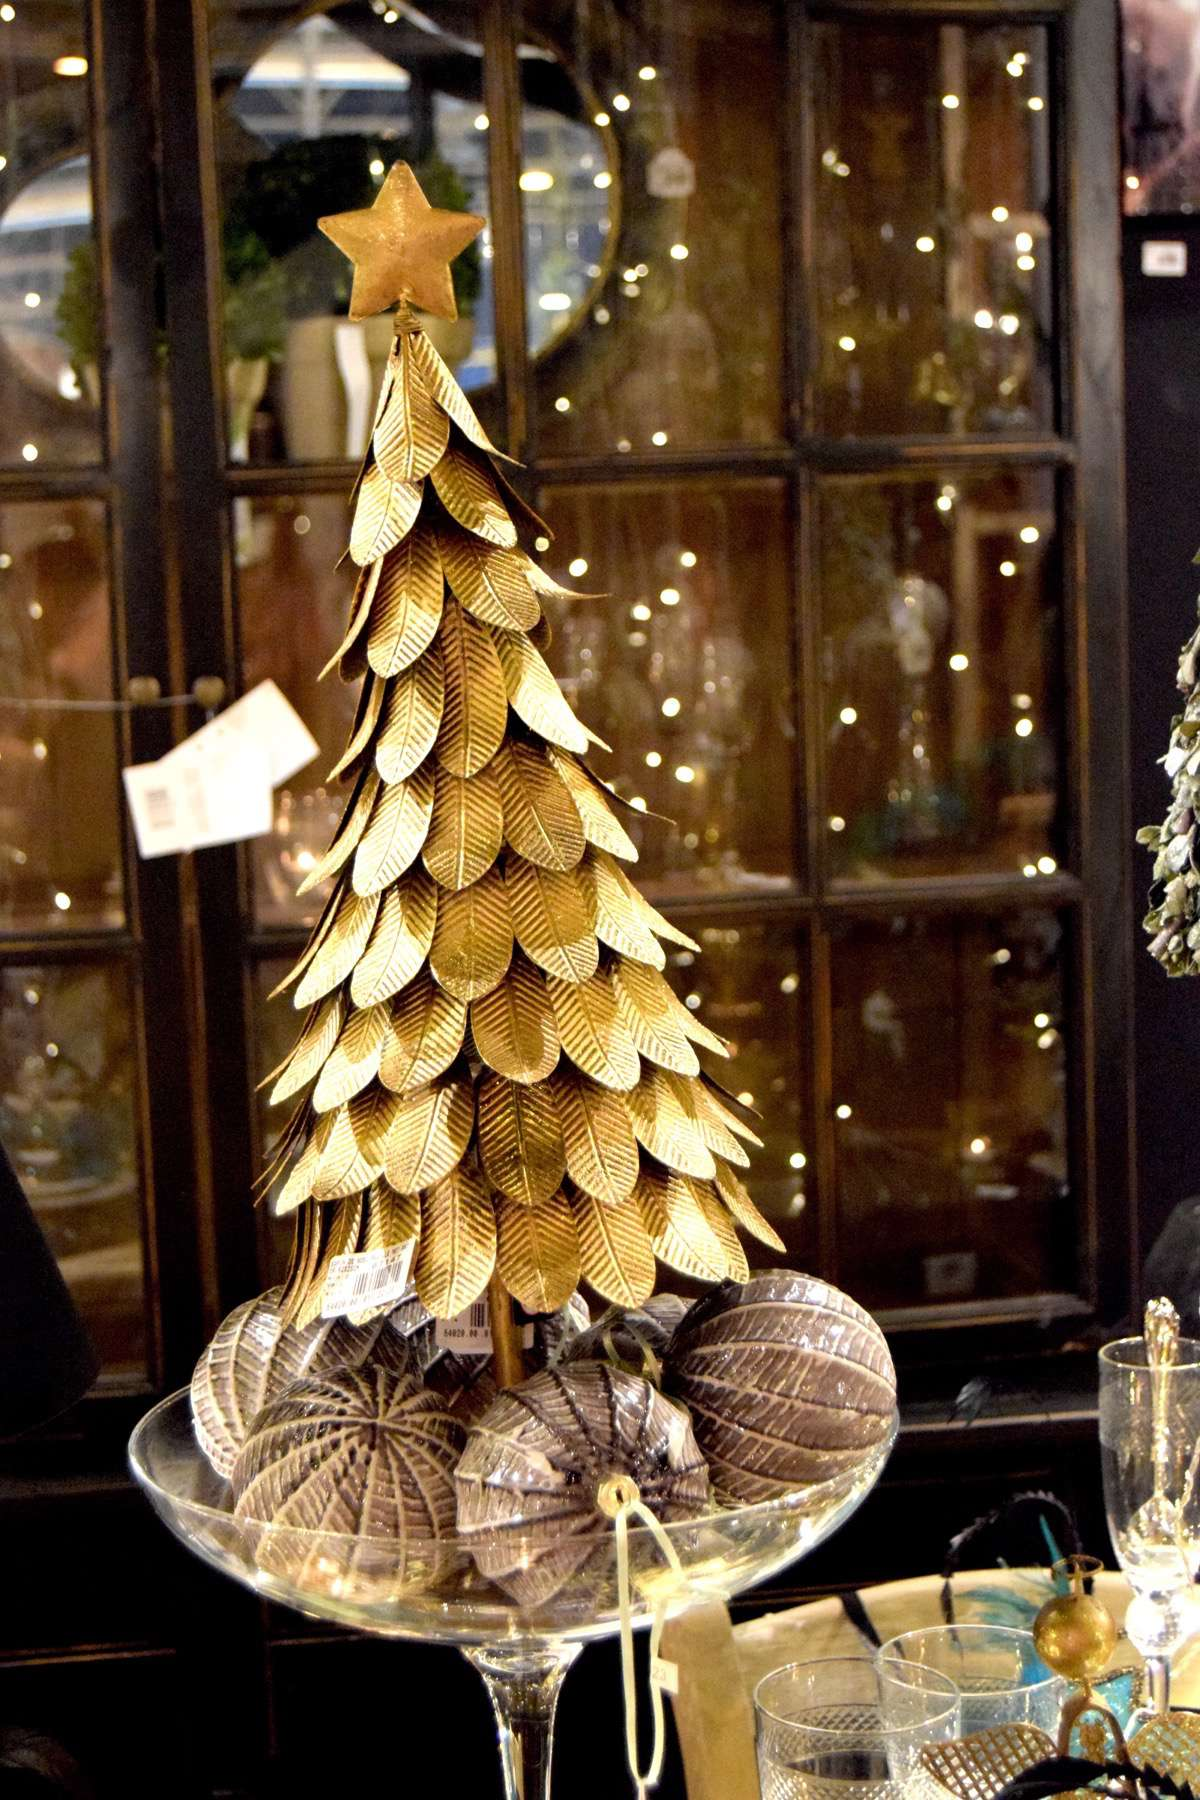 "10-original-Christmas-trees ""width ="" 1200 ""height ="" 1800 ""srcset ="" https://navidad.es/wp-content/uploads/2009/12/10-arboles-de-navidad-originales .jpg 1200w, https://navidad.es/wp-content/uploads/2009/12/10-arboles-de-navidad-originales-200x300.jpg 200w, https://navidad.es/wp-content/uploads /2009/12/10-arboles-de-navidad-originales-768x1152.jpg 768w, https://navidad.es/wp-content/uploads/2009/12/10-arboles-de-navidad-originales-683x1024. jpg 683w, https://navidad.es/wp-content/uploads/2009/12/10-arboles-de-navidad-originales-696x1044.jpg 696w, https://navidad.es/wp-content/uploads/ 2009/12/10-original-Christmas-trees-1068x1602.jpg 1068w, https://navidad.es/wp-content/uploads/2009/12/10-arboles-de-navidad-originales-280x420.jpg 280w ""tailles ="" (largeur maximale: 1200px) 100vw, 1200px ""/></p> <h2><span class="